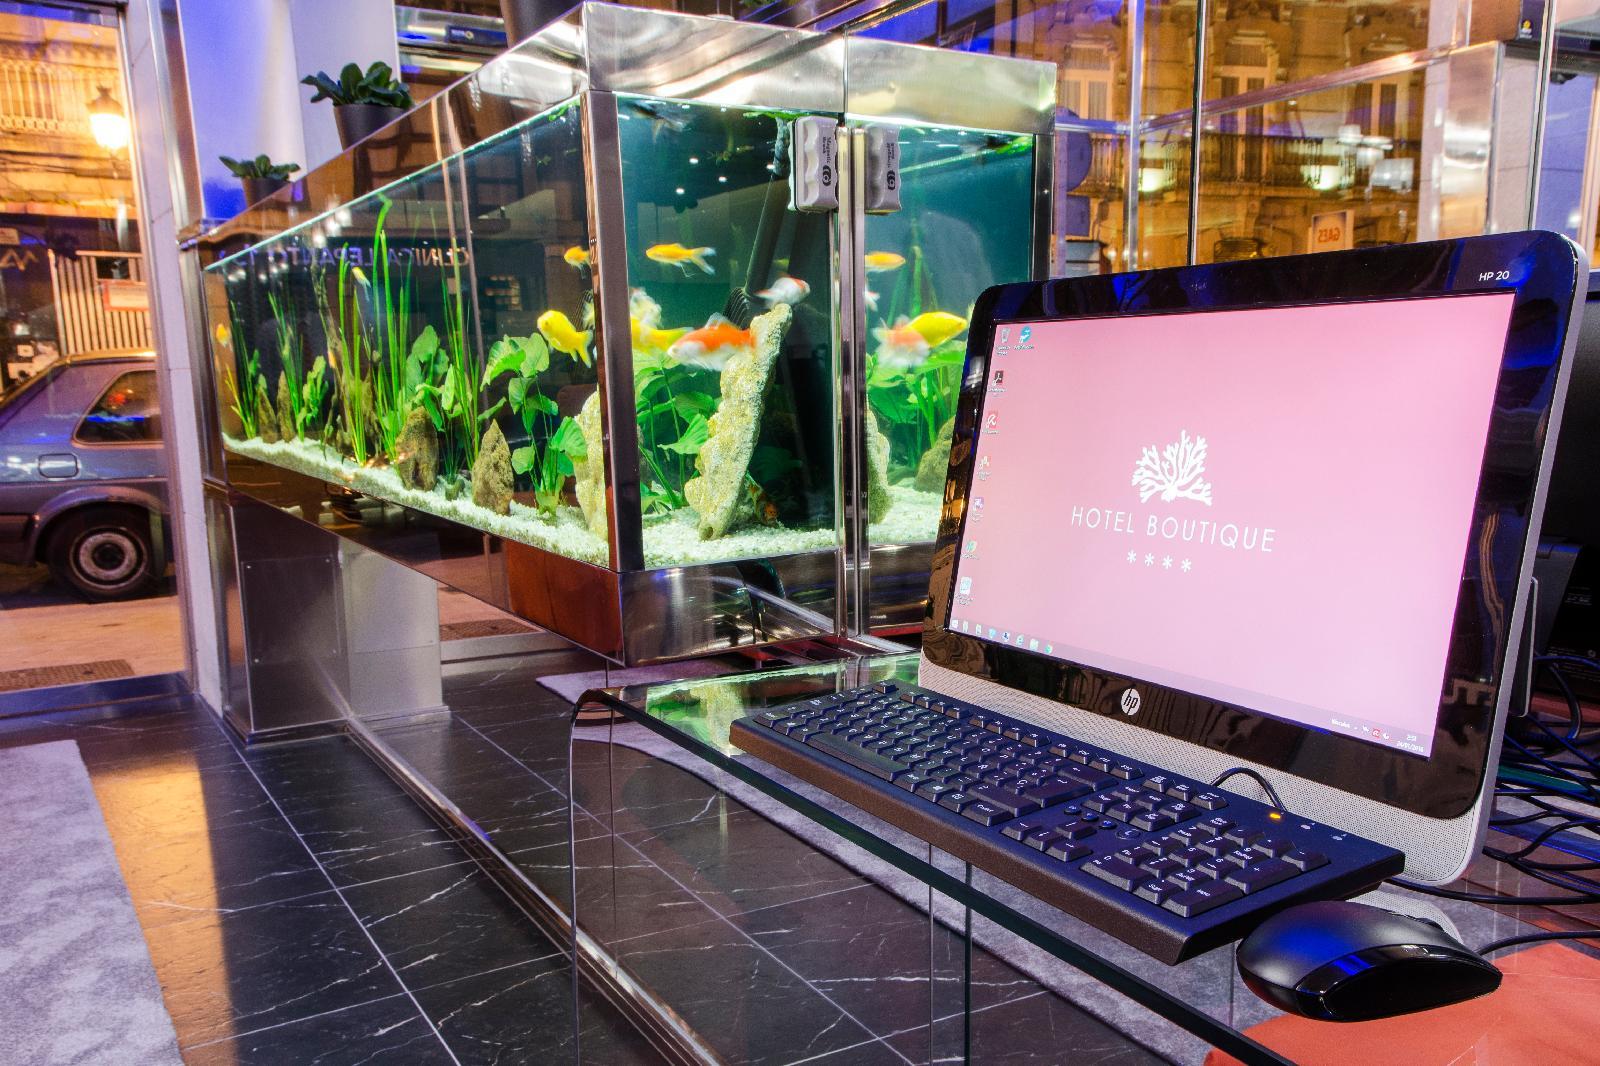 7. Agua De Mar Hotel Boutique